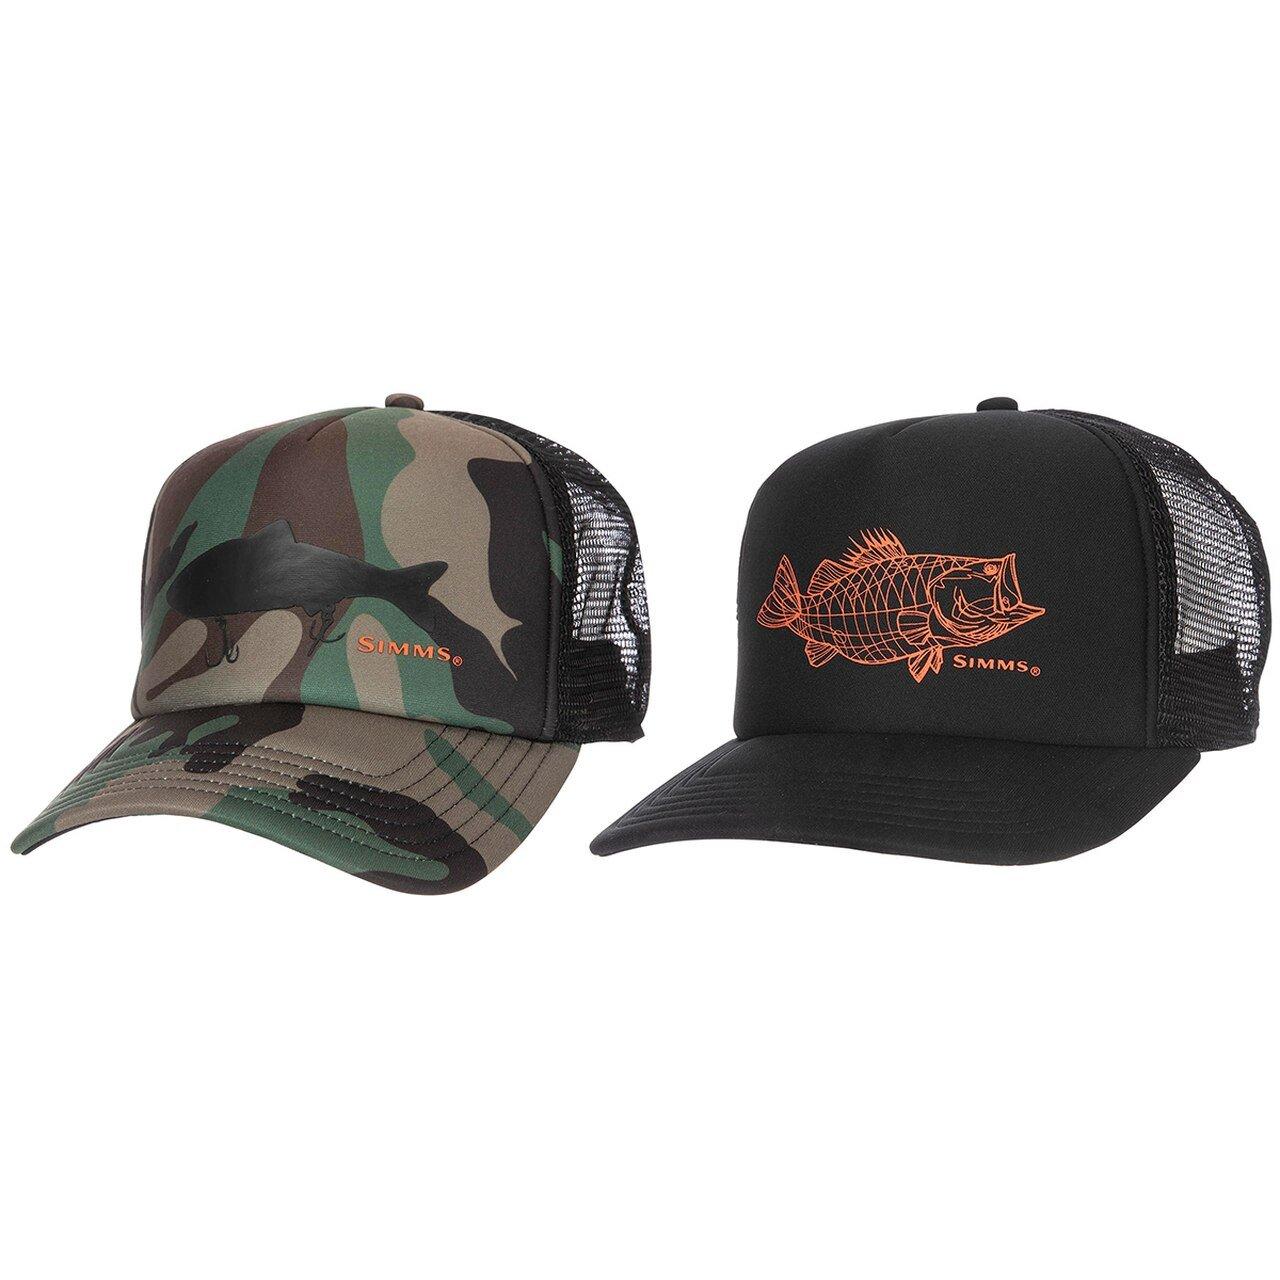 Simms Throwback Trucker Hat